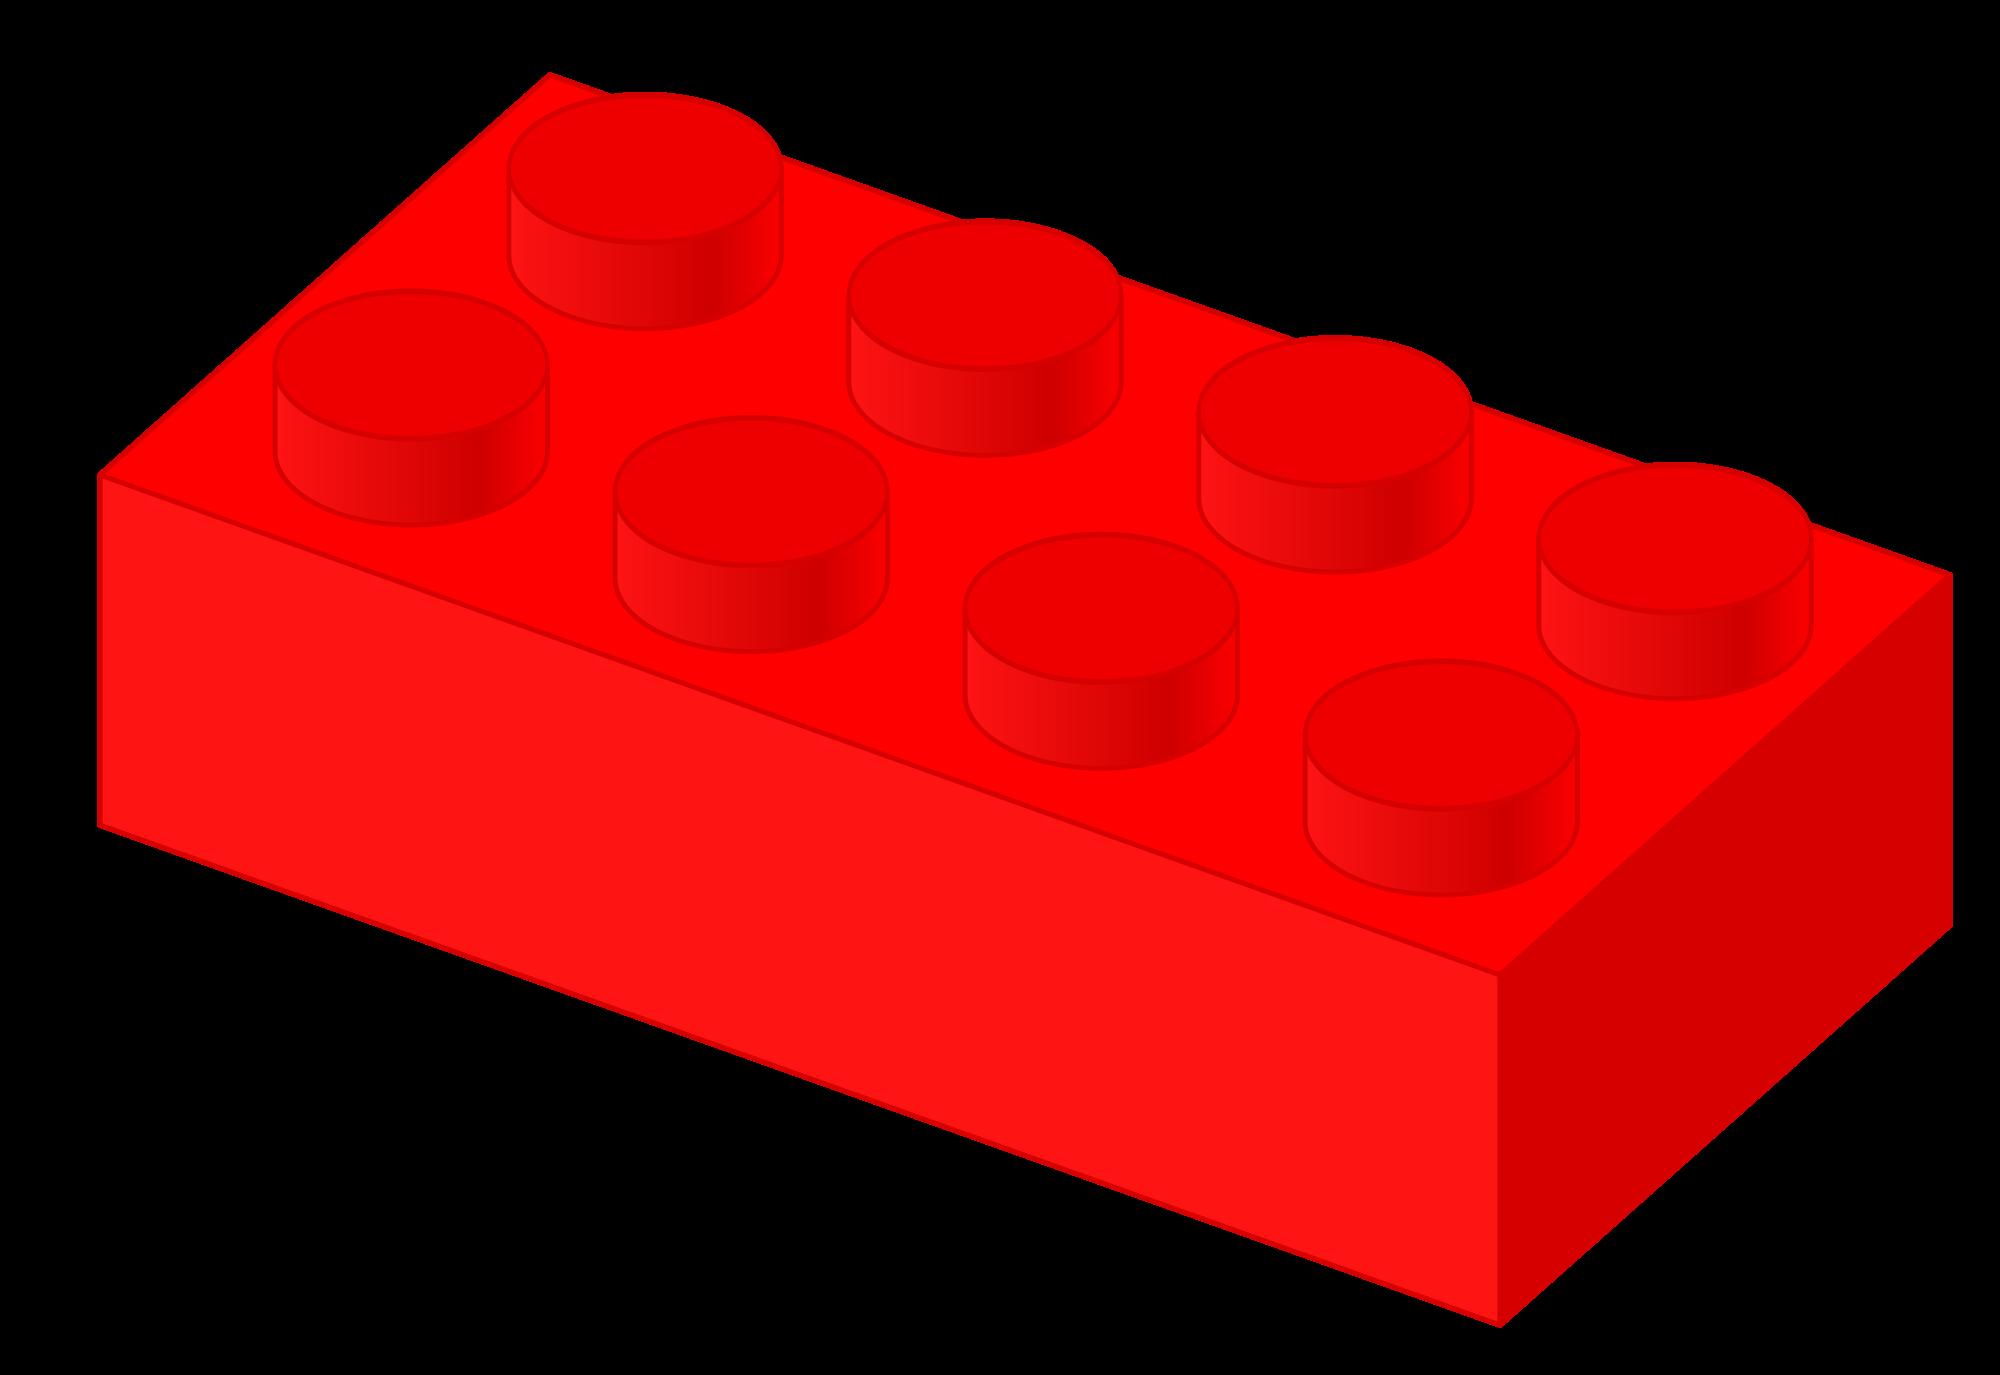 2000x1375 Plastic Clipart Lego